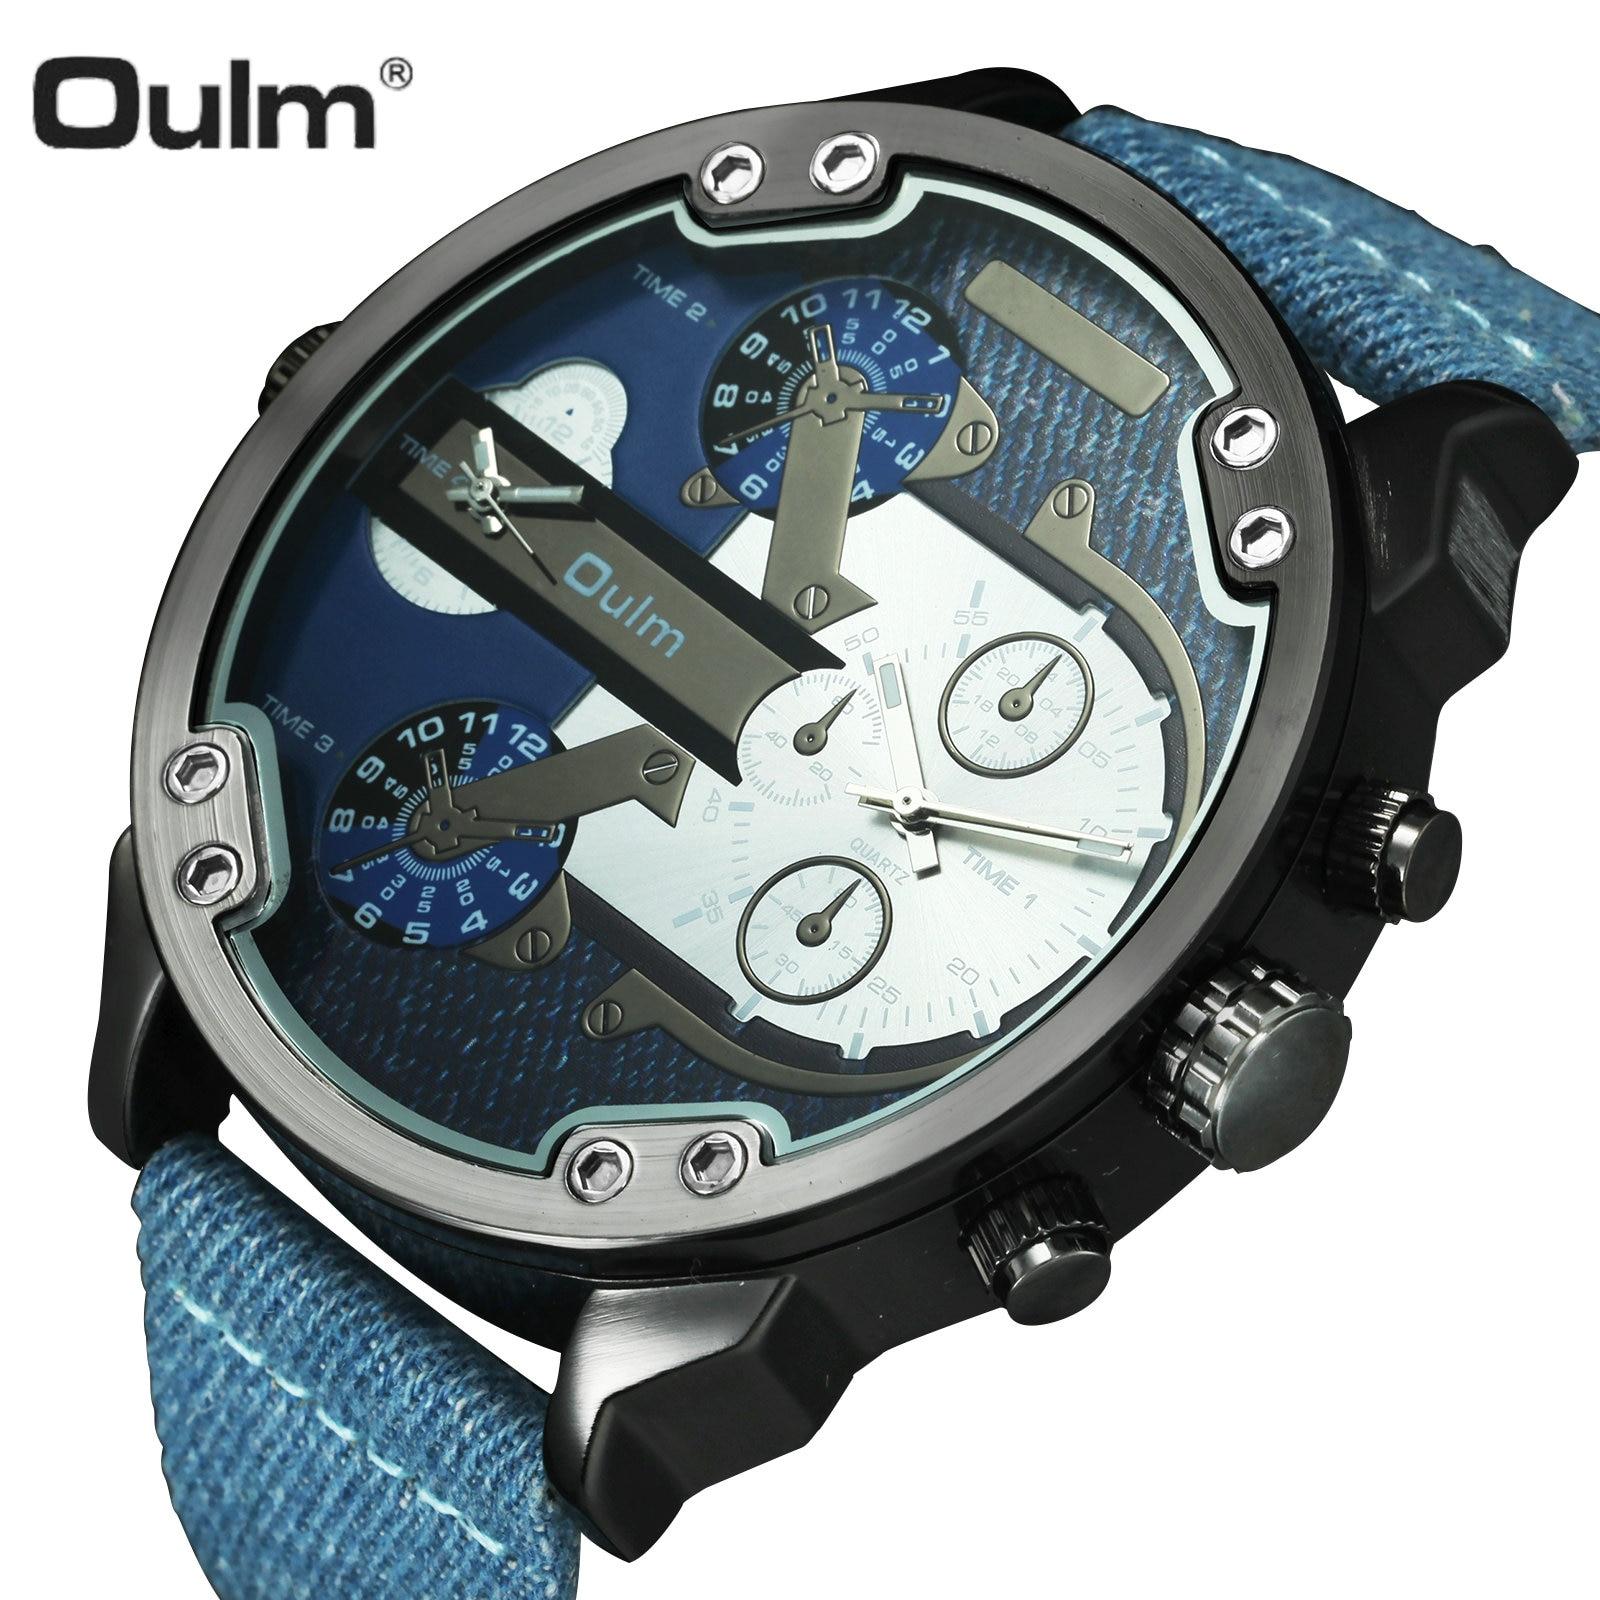 OULM Sports Quartz Watch Men Big Case Military Mens Watches Top Brand Luxury Canvas Strap 2 Time Zone Fashion Casual Wristwatch